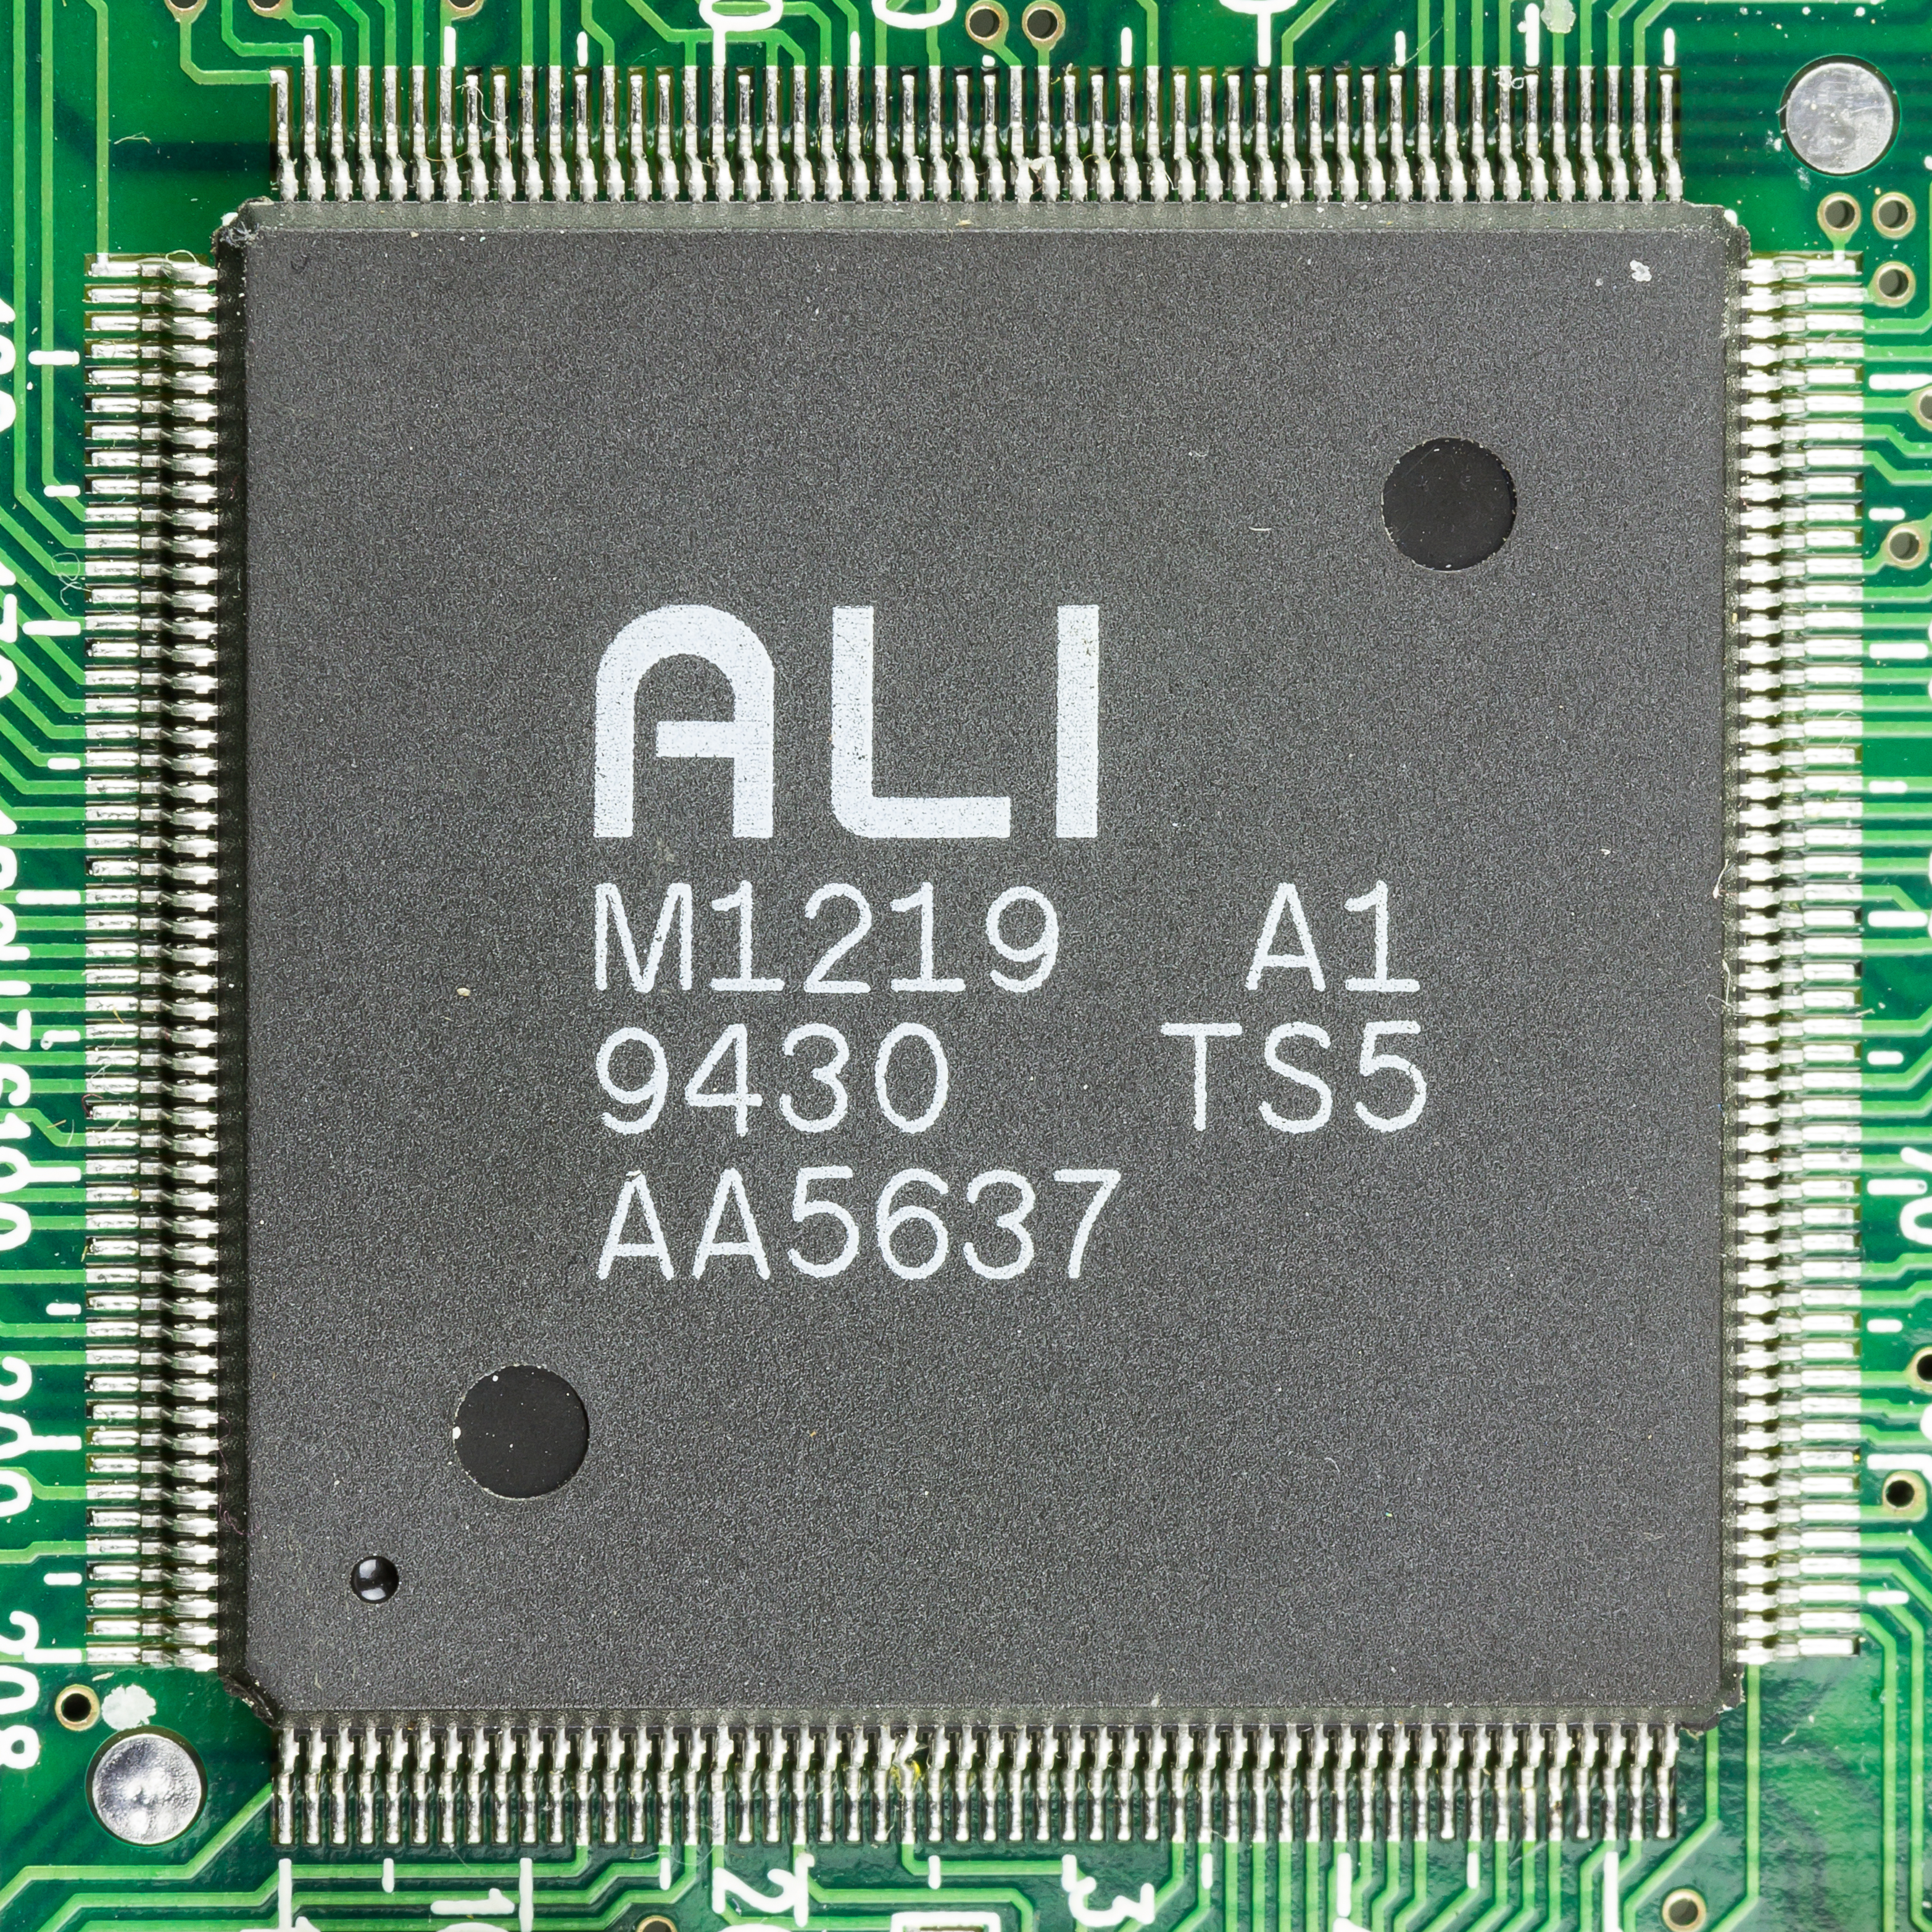 File:Laptop Acrobat Model NBD 486C, Type DXh2 - ALi M1219 on ...